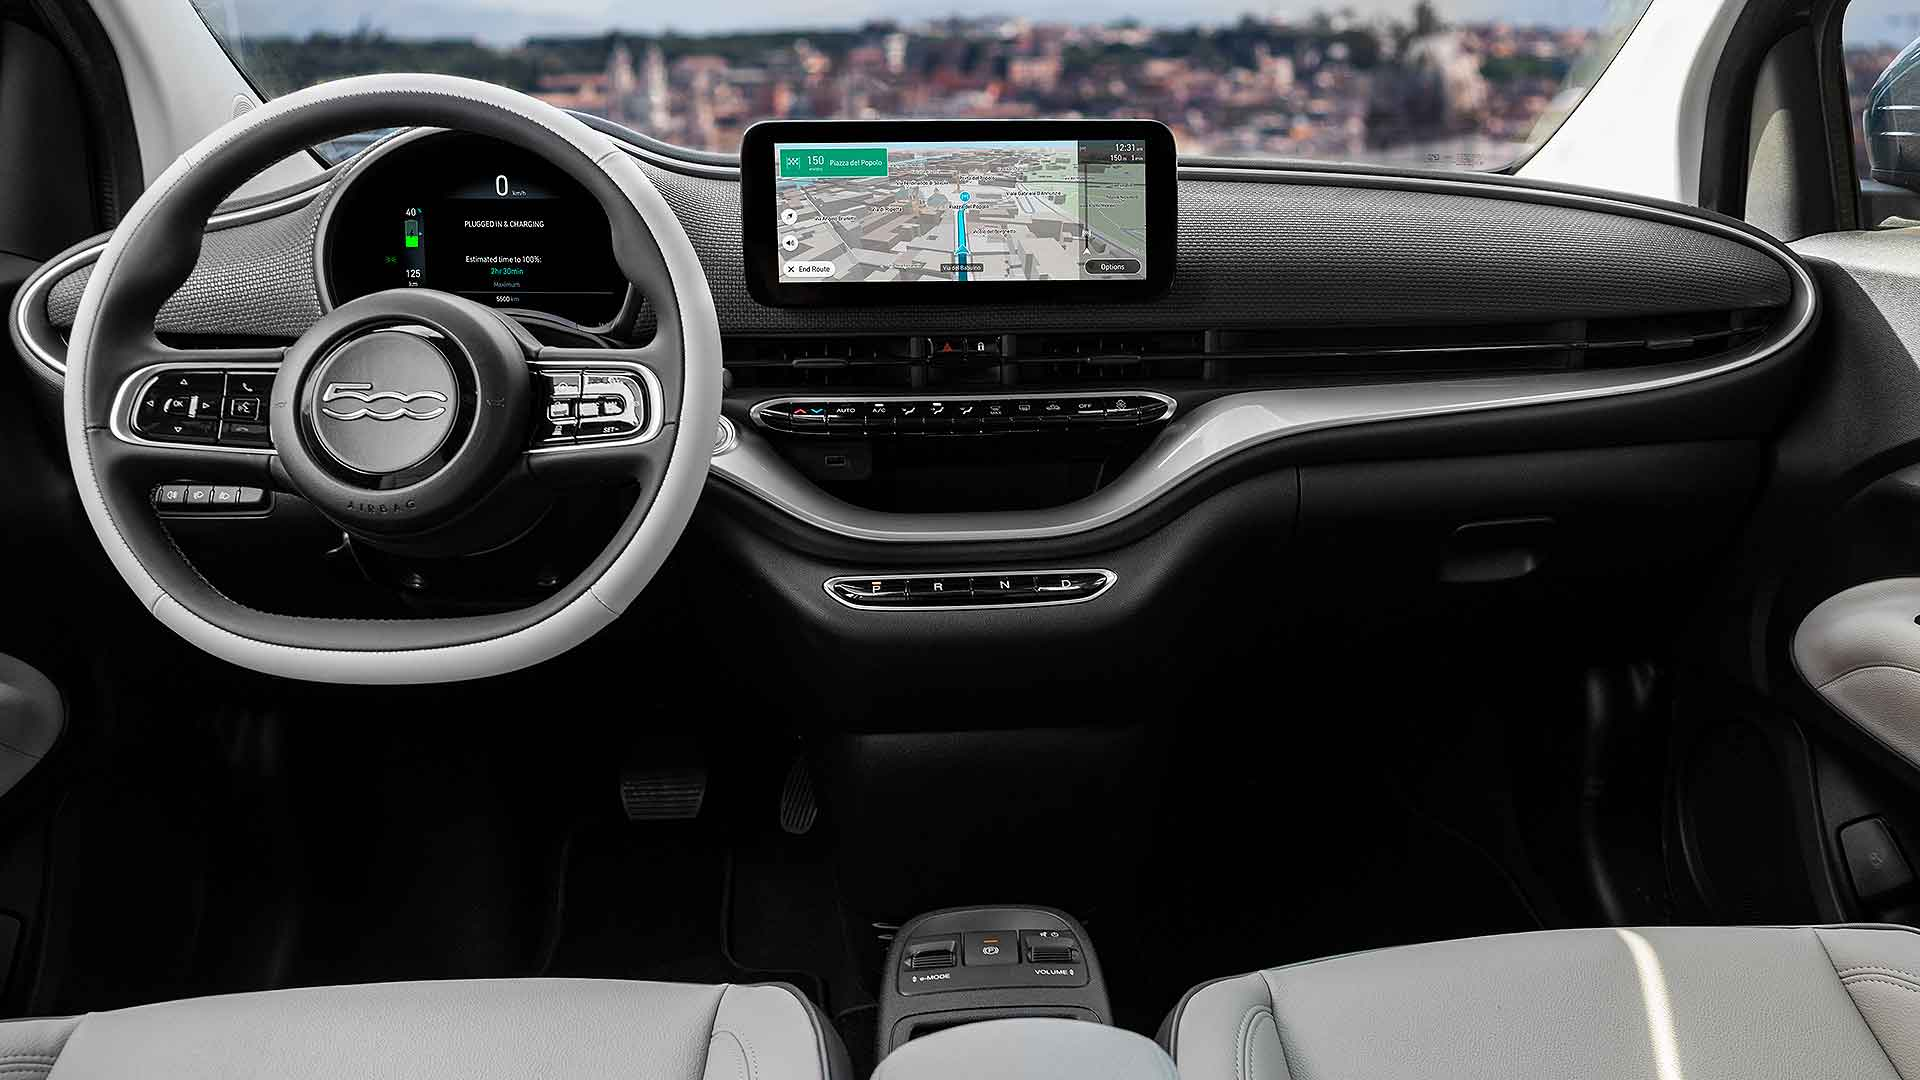 Electric Fiat 500 hatch interior